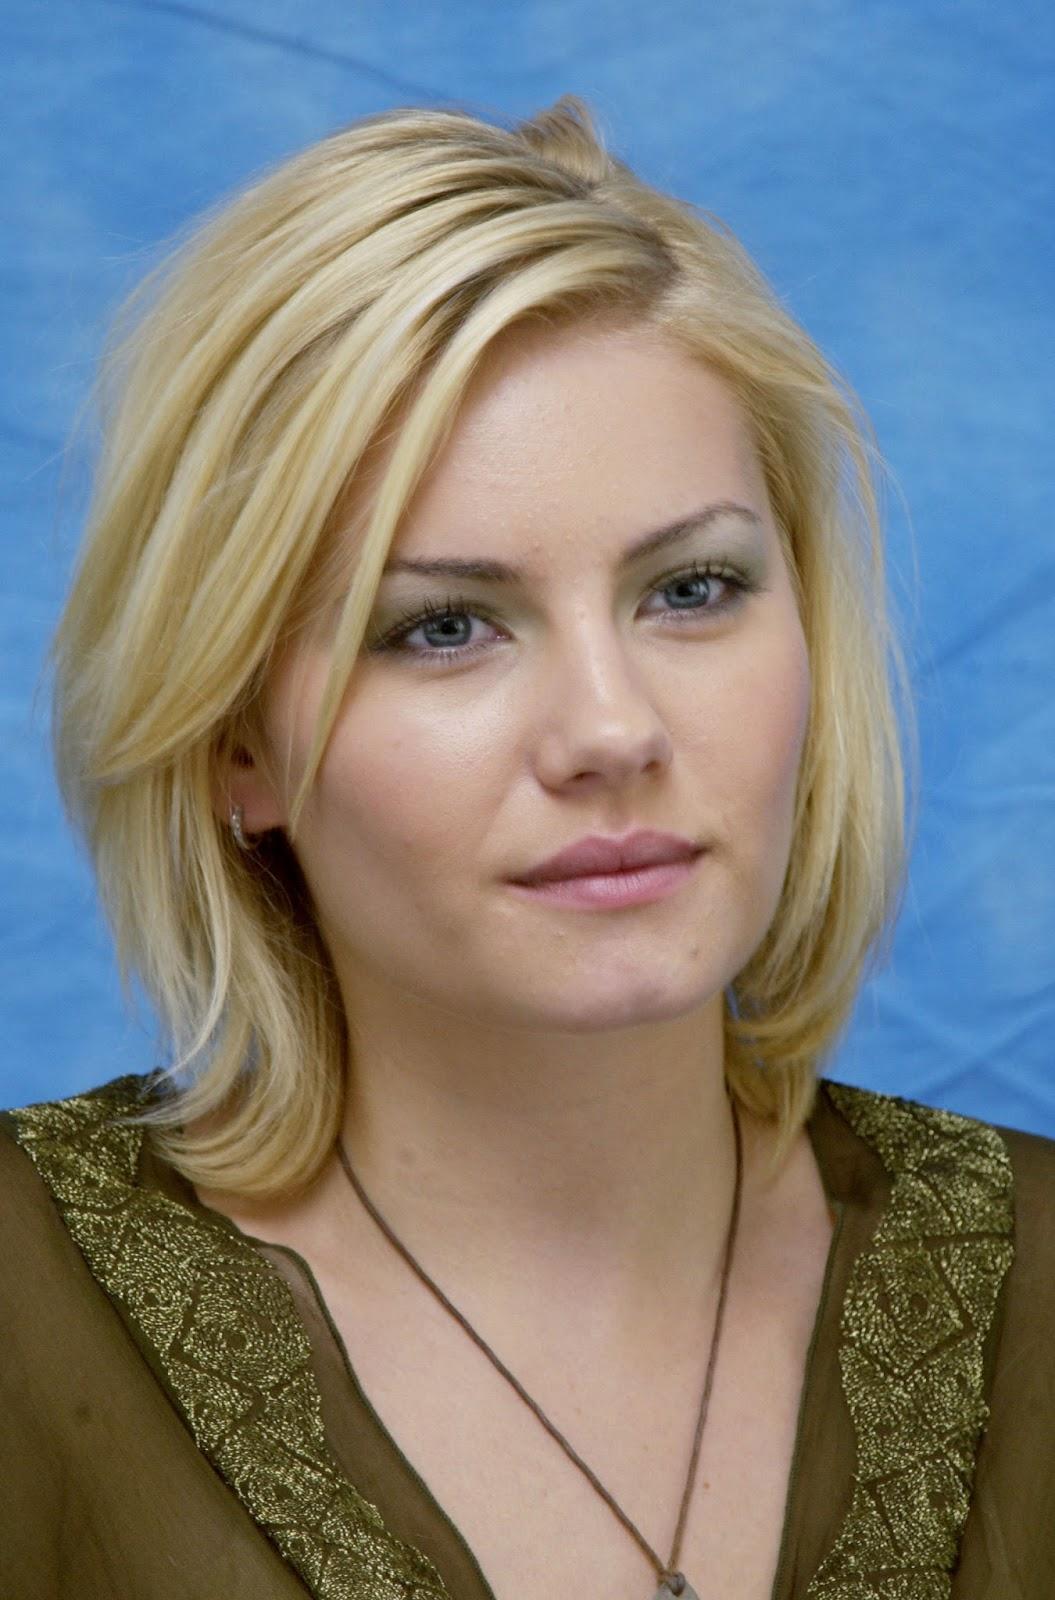 Elisha Cuthbert Wiki Biography Dob Age Height Weight